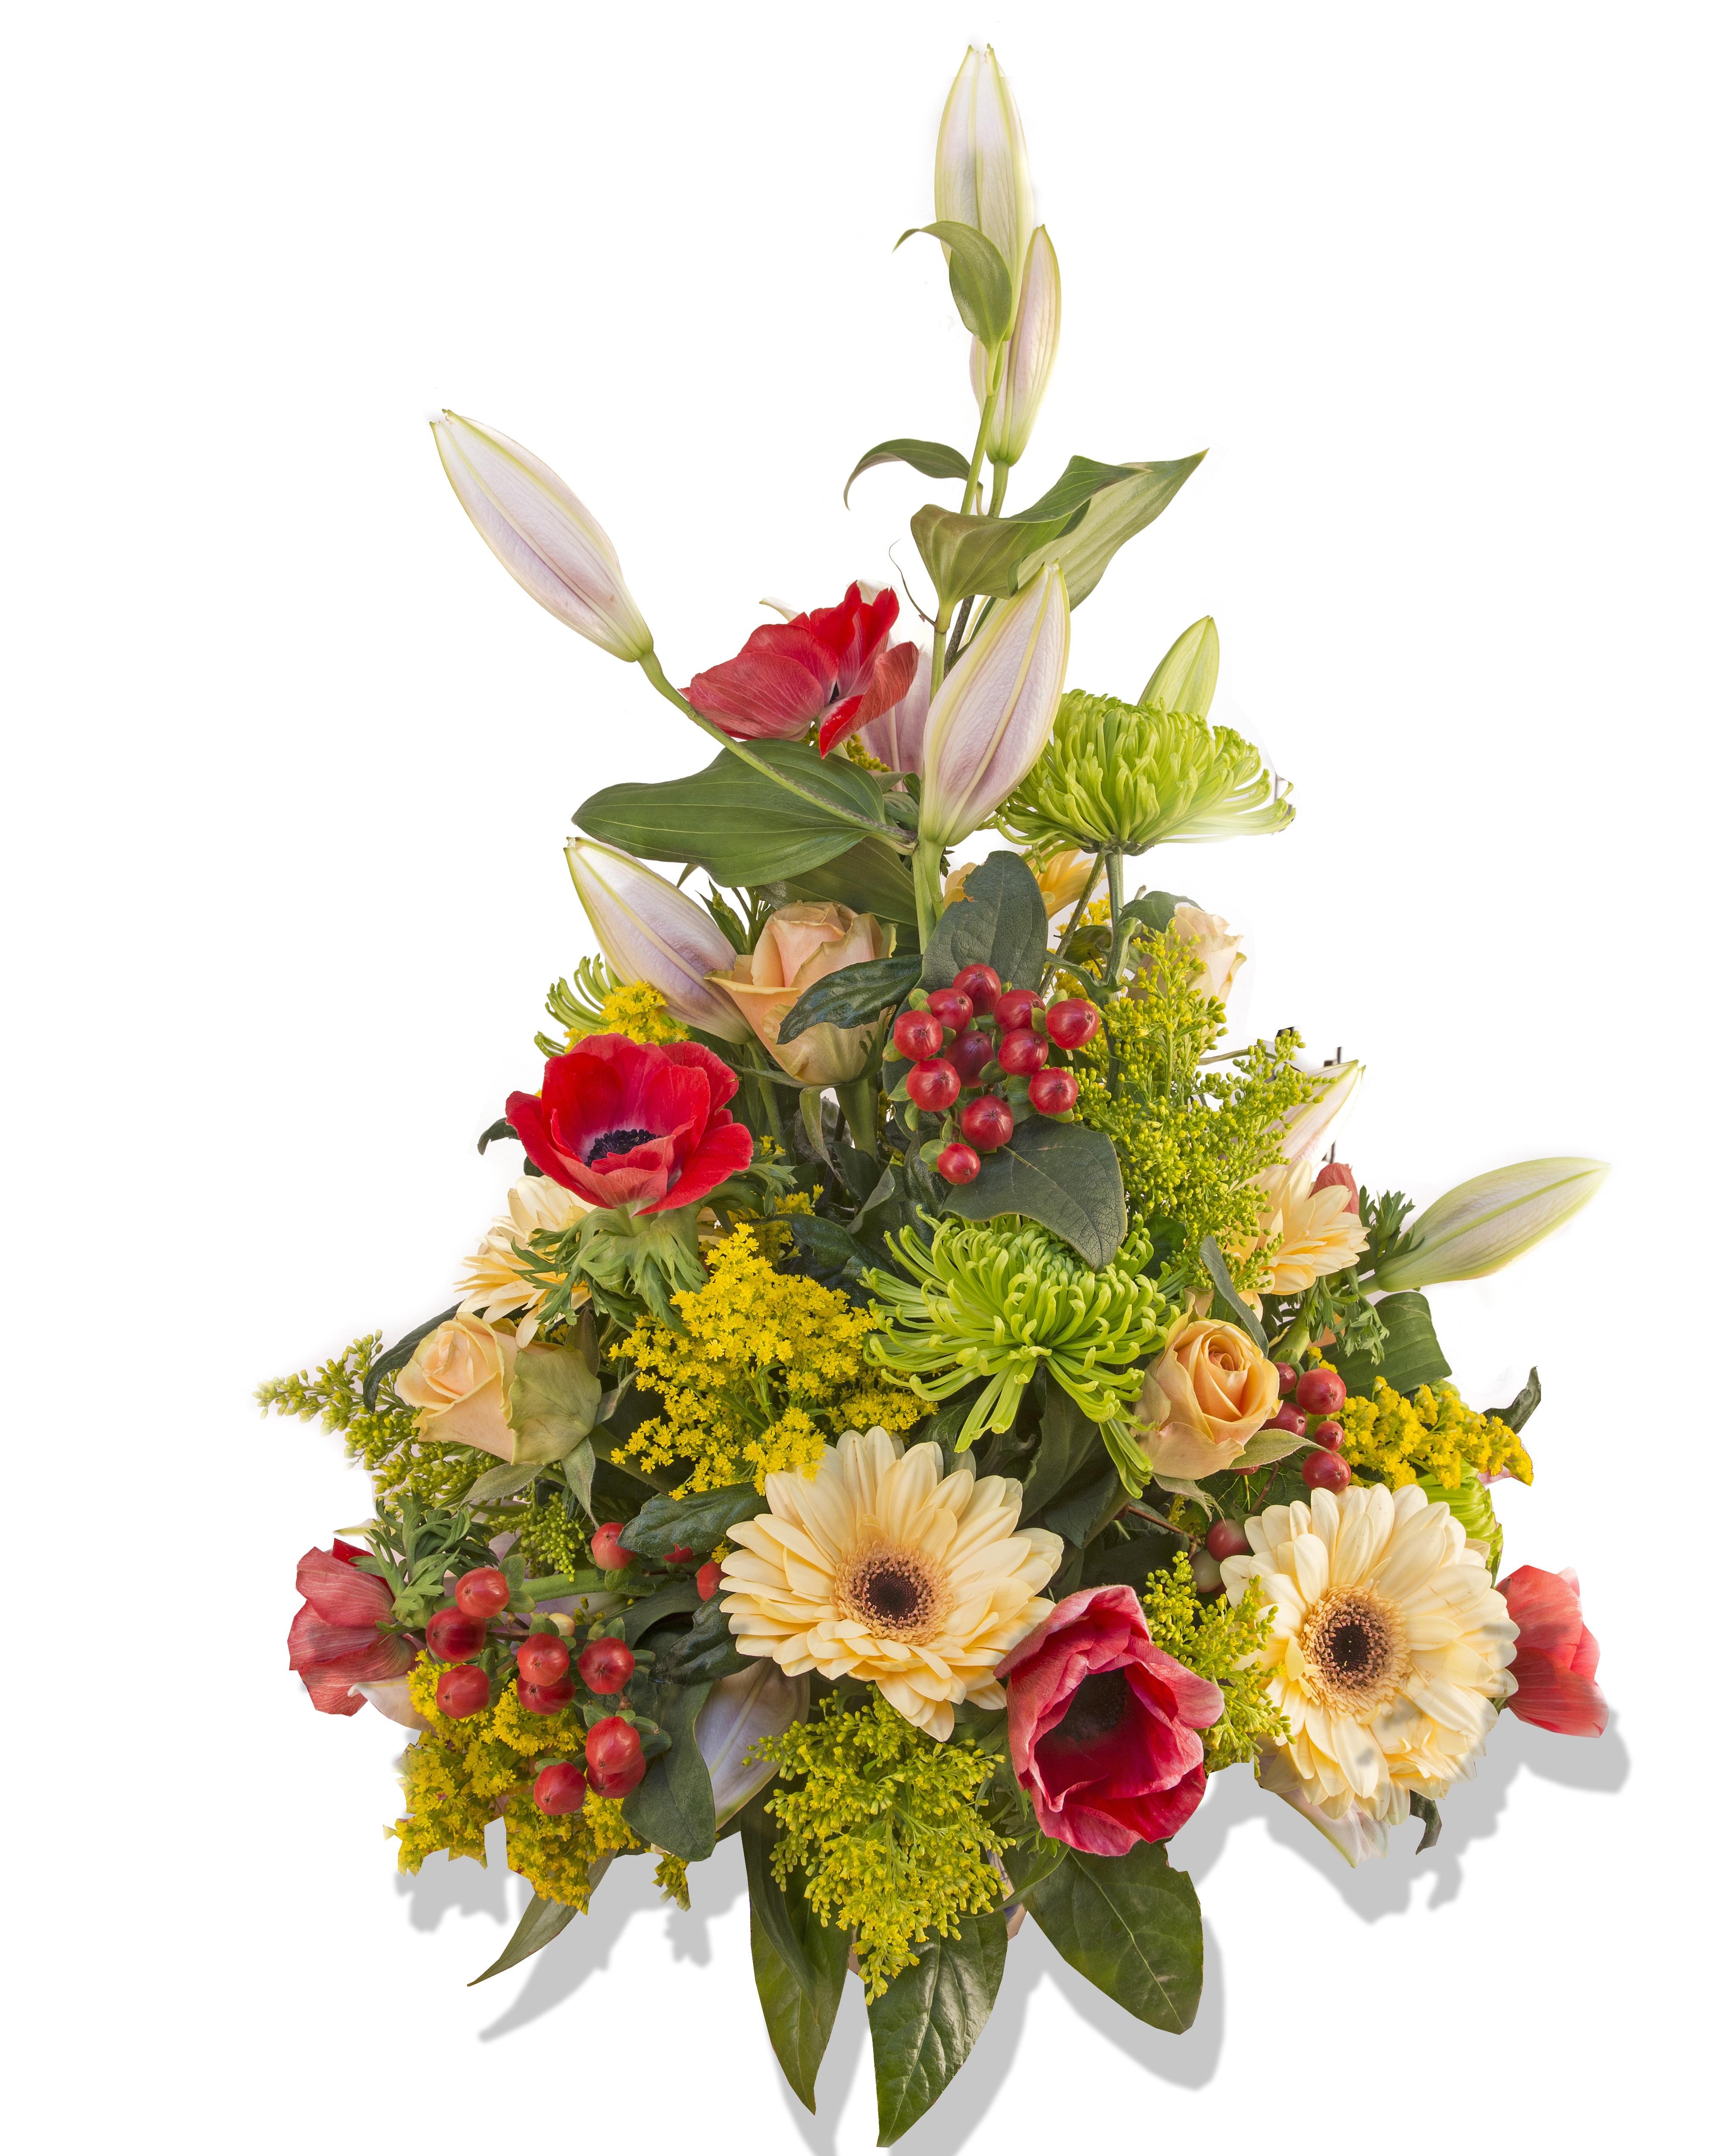 Free Images : petal, plants, art, gerbera, floristry, retail ...